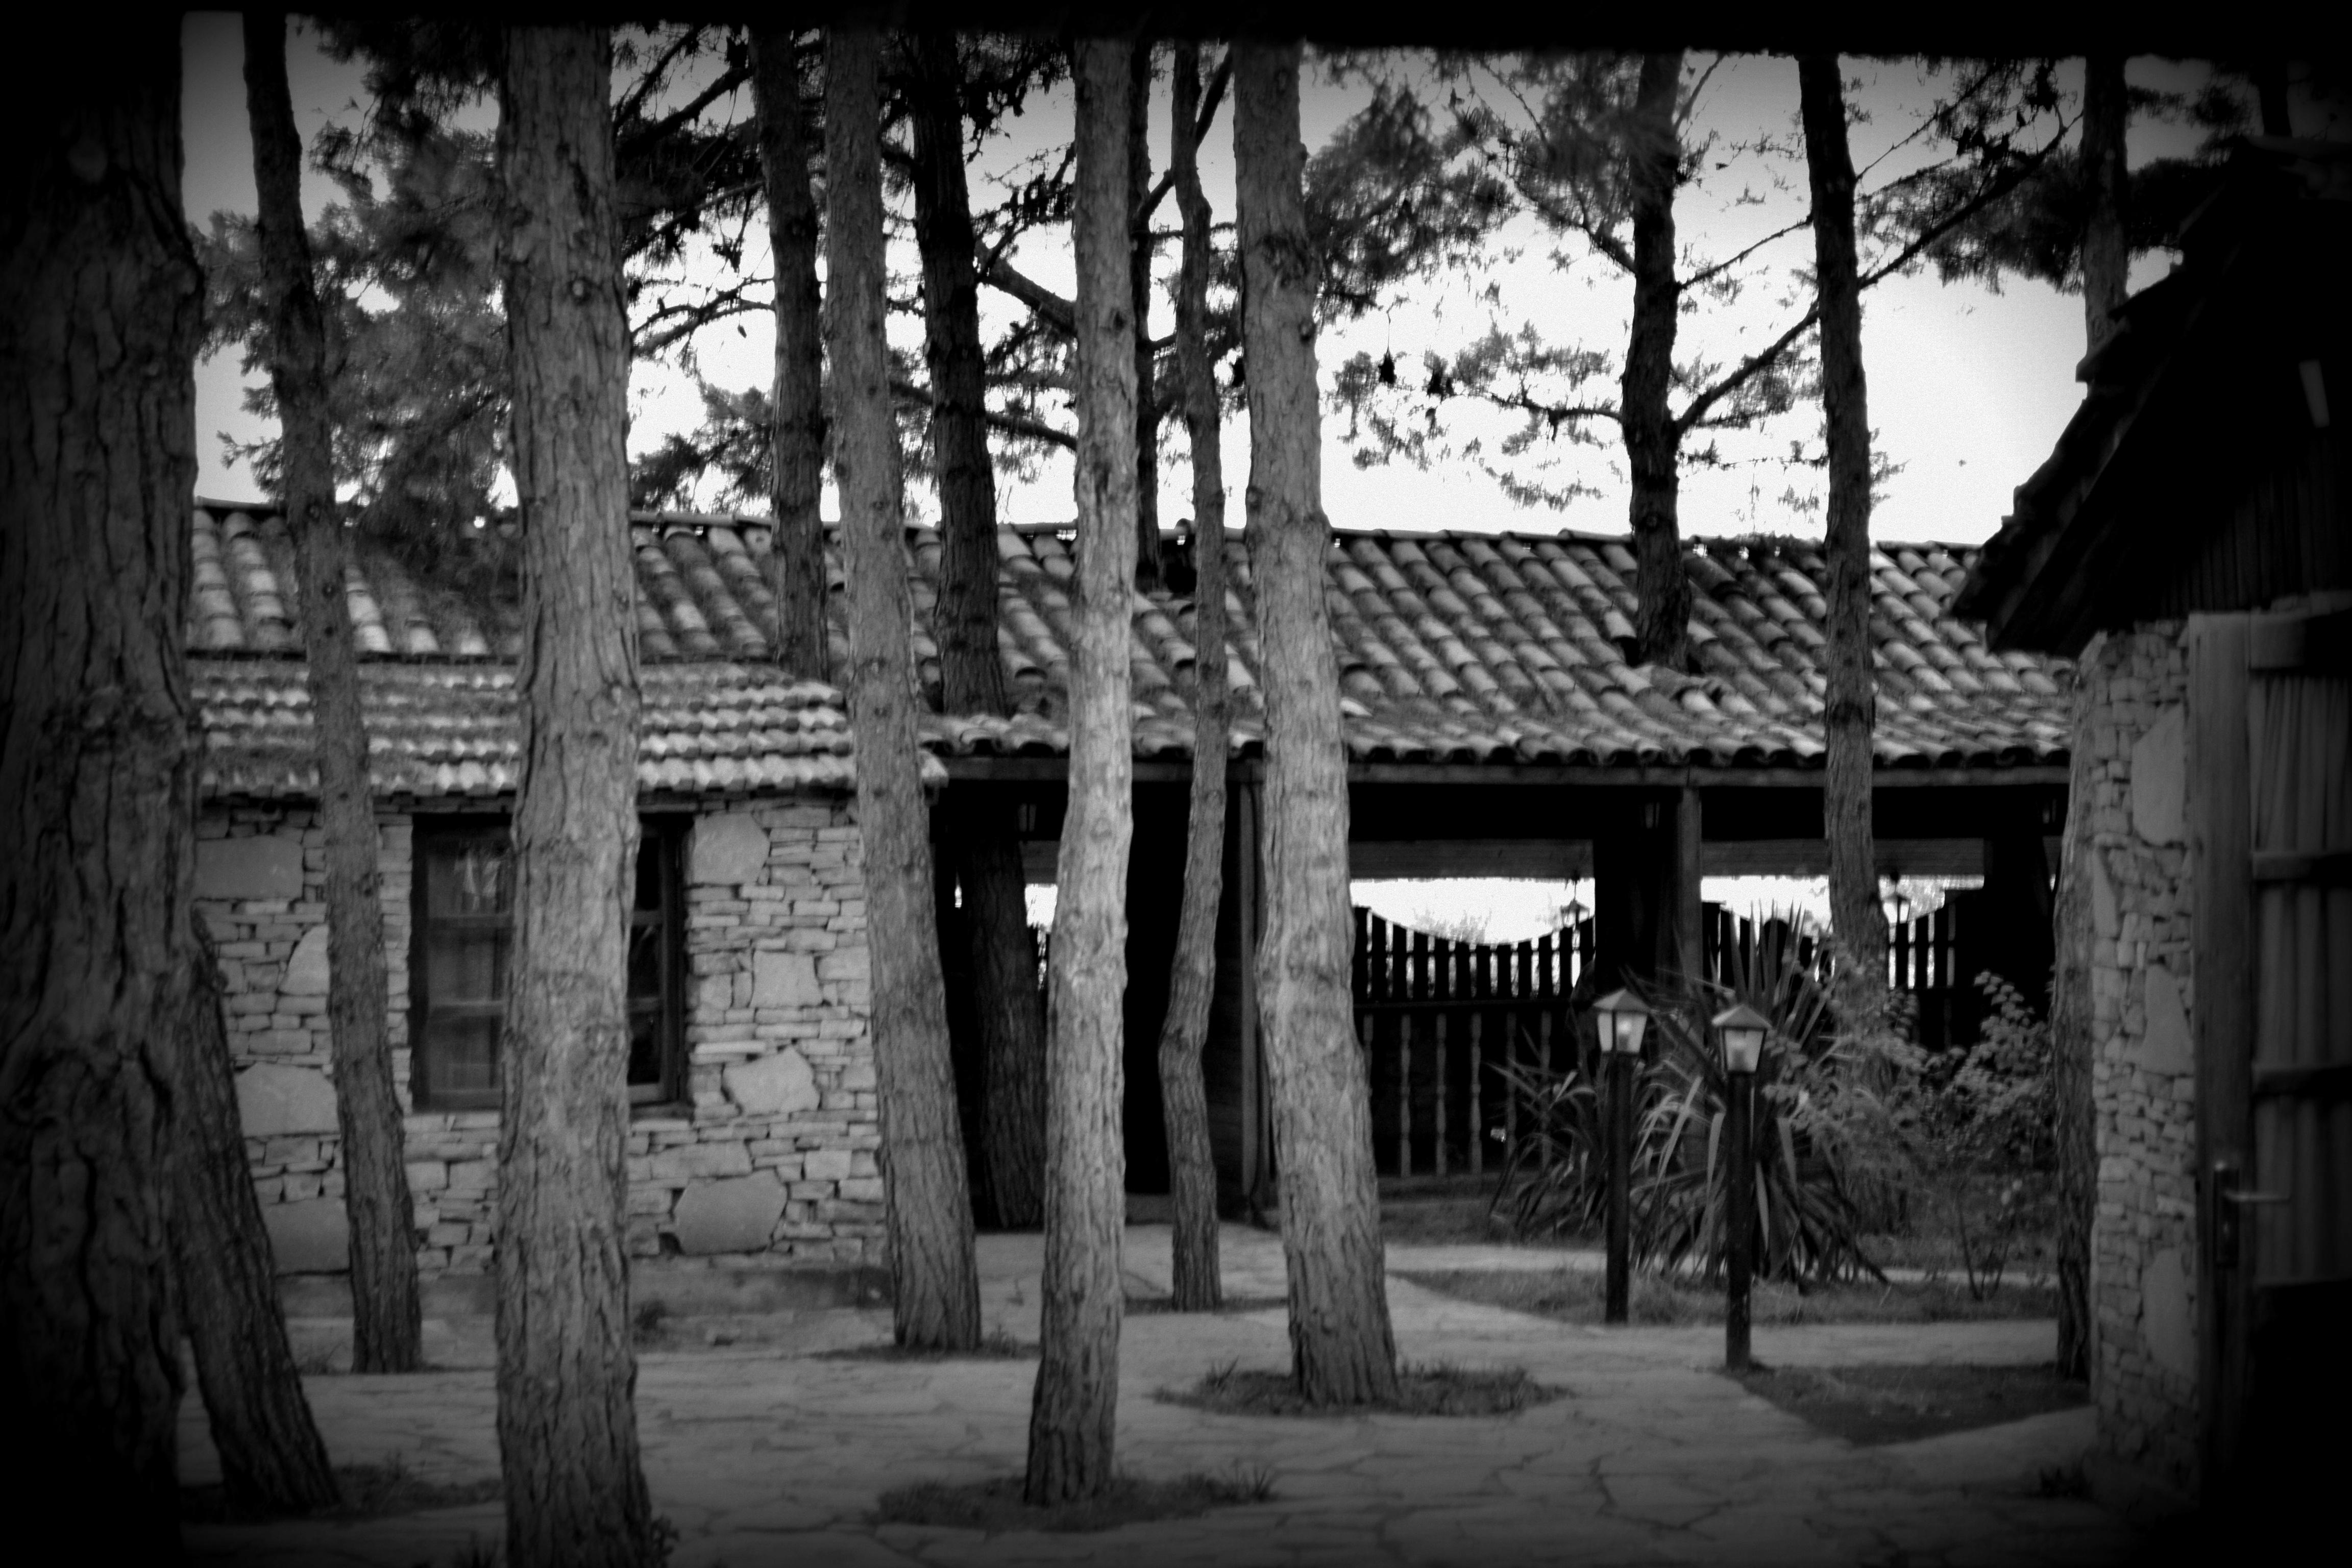 Bw Photo Black Tree Black And White Monochrome Photography Woody